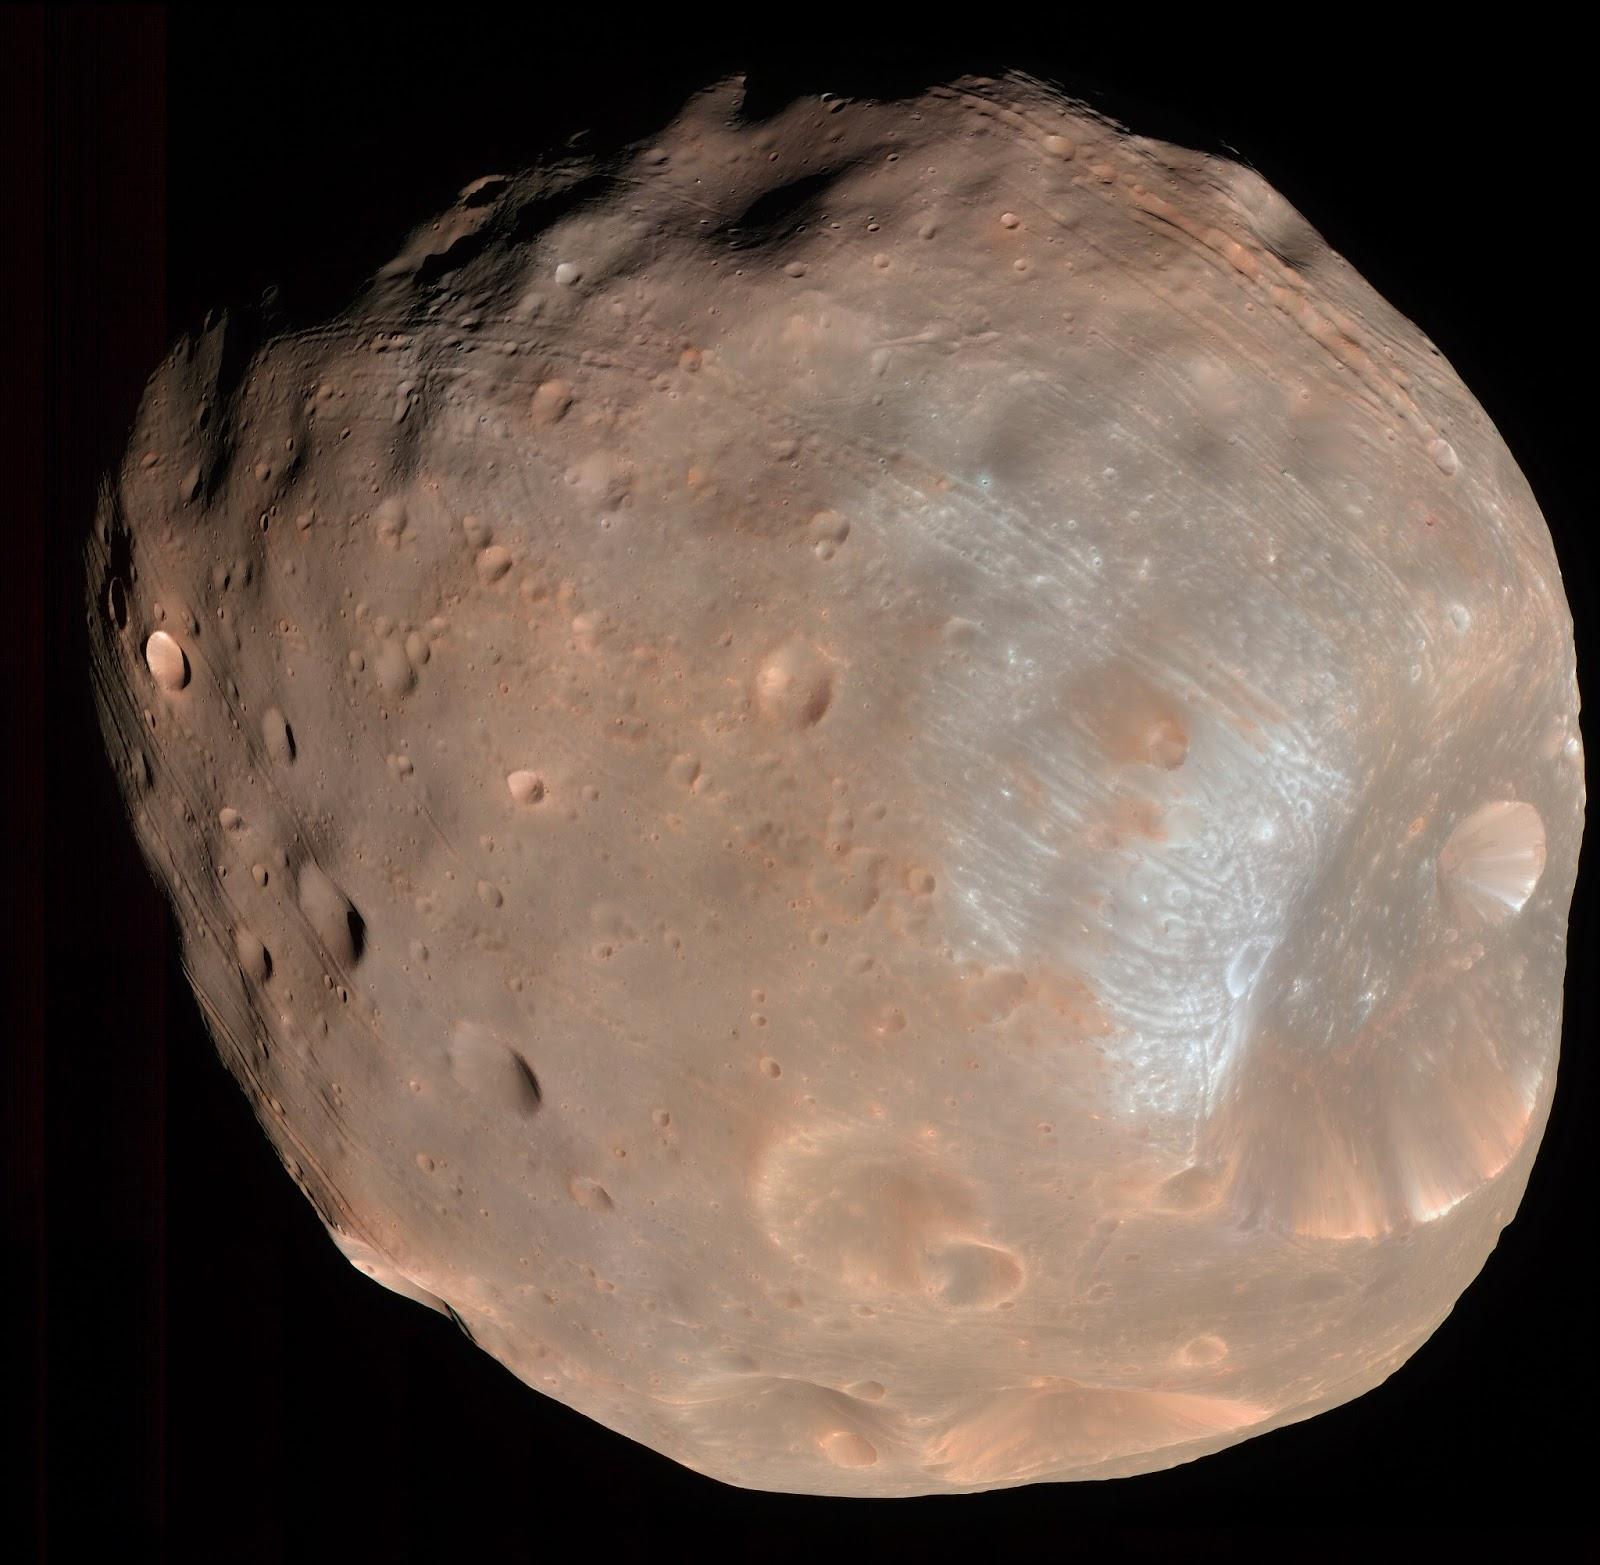 Imagen de Fobos tomada por la sonda Mars Reconnaissance Orbiter